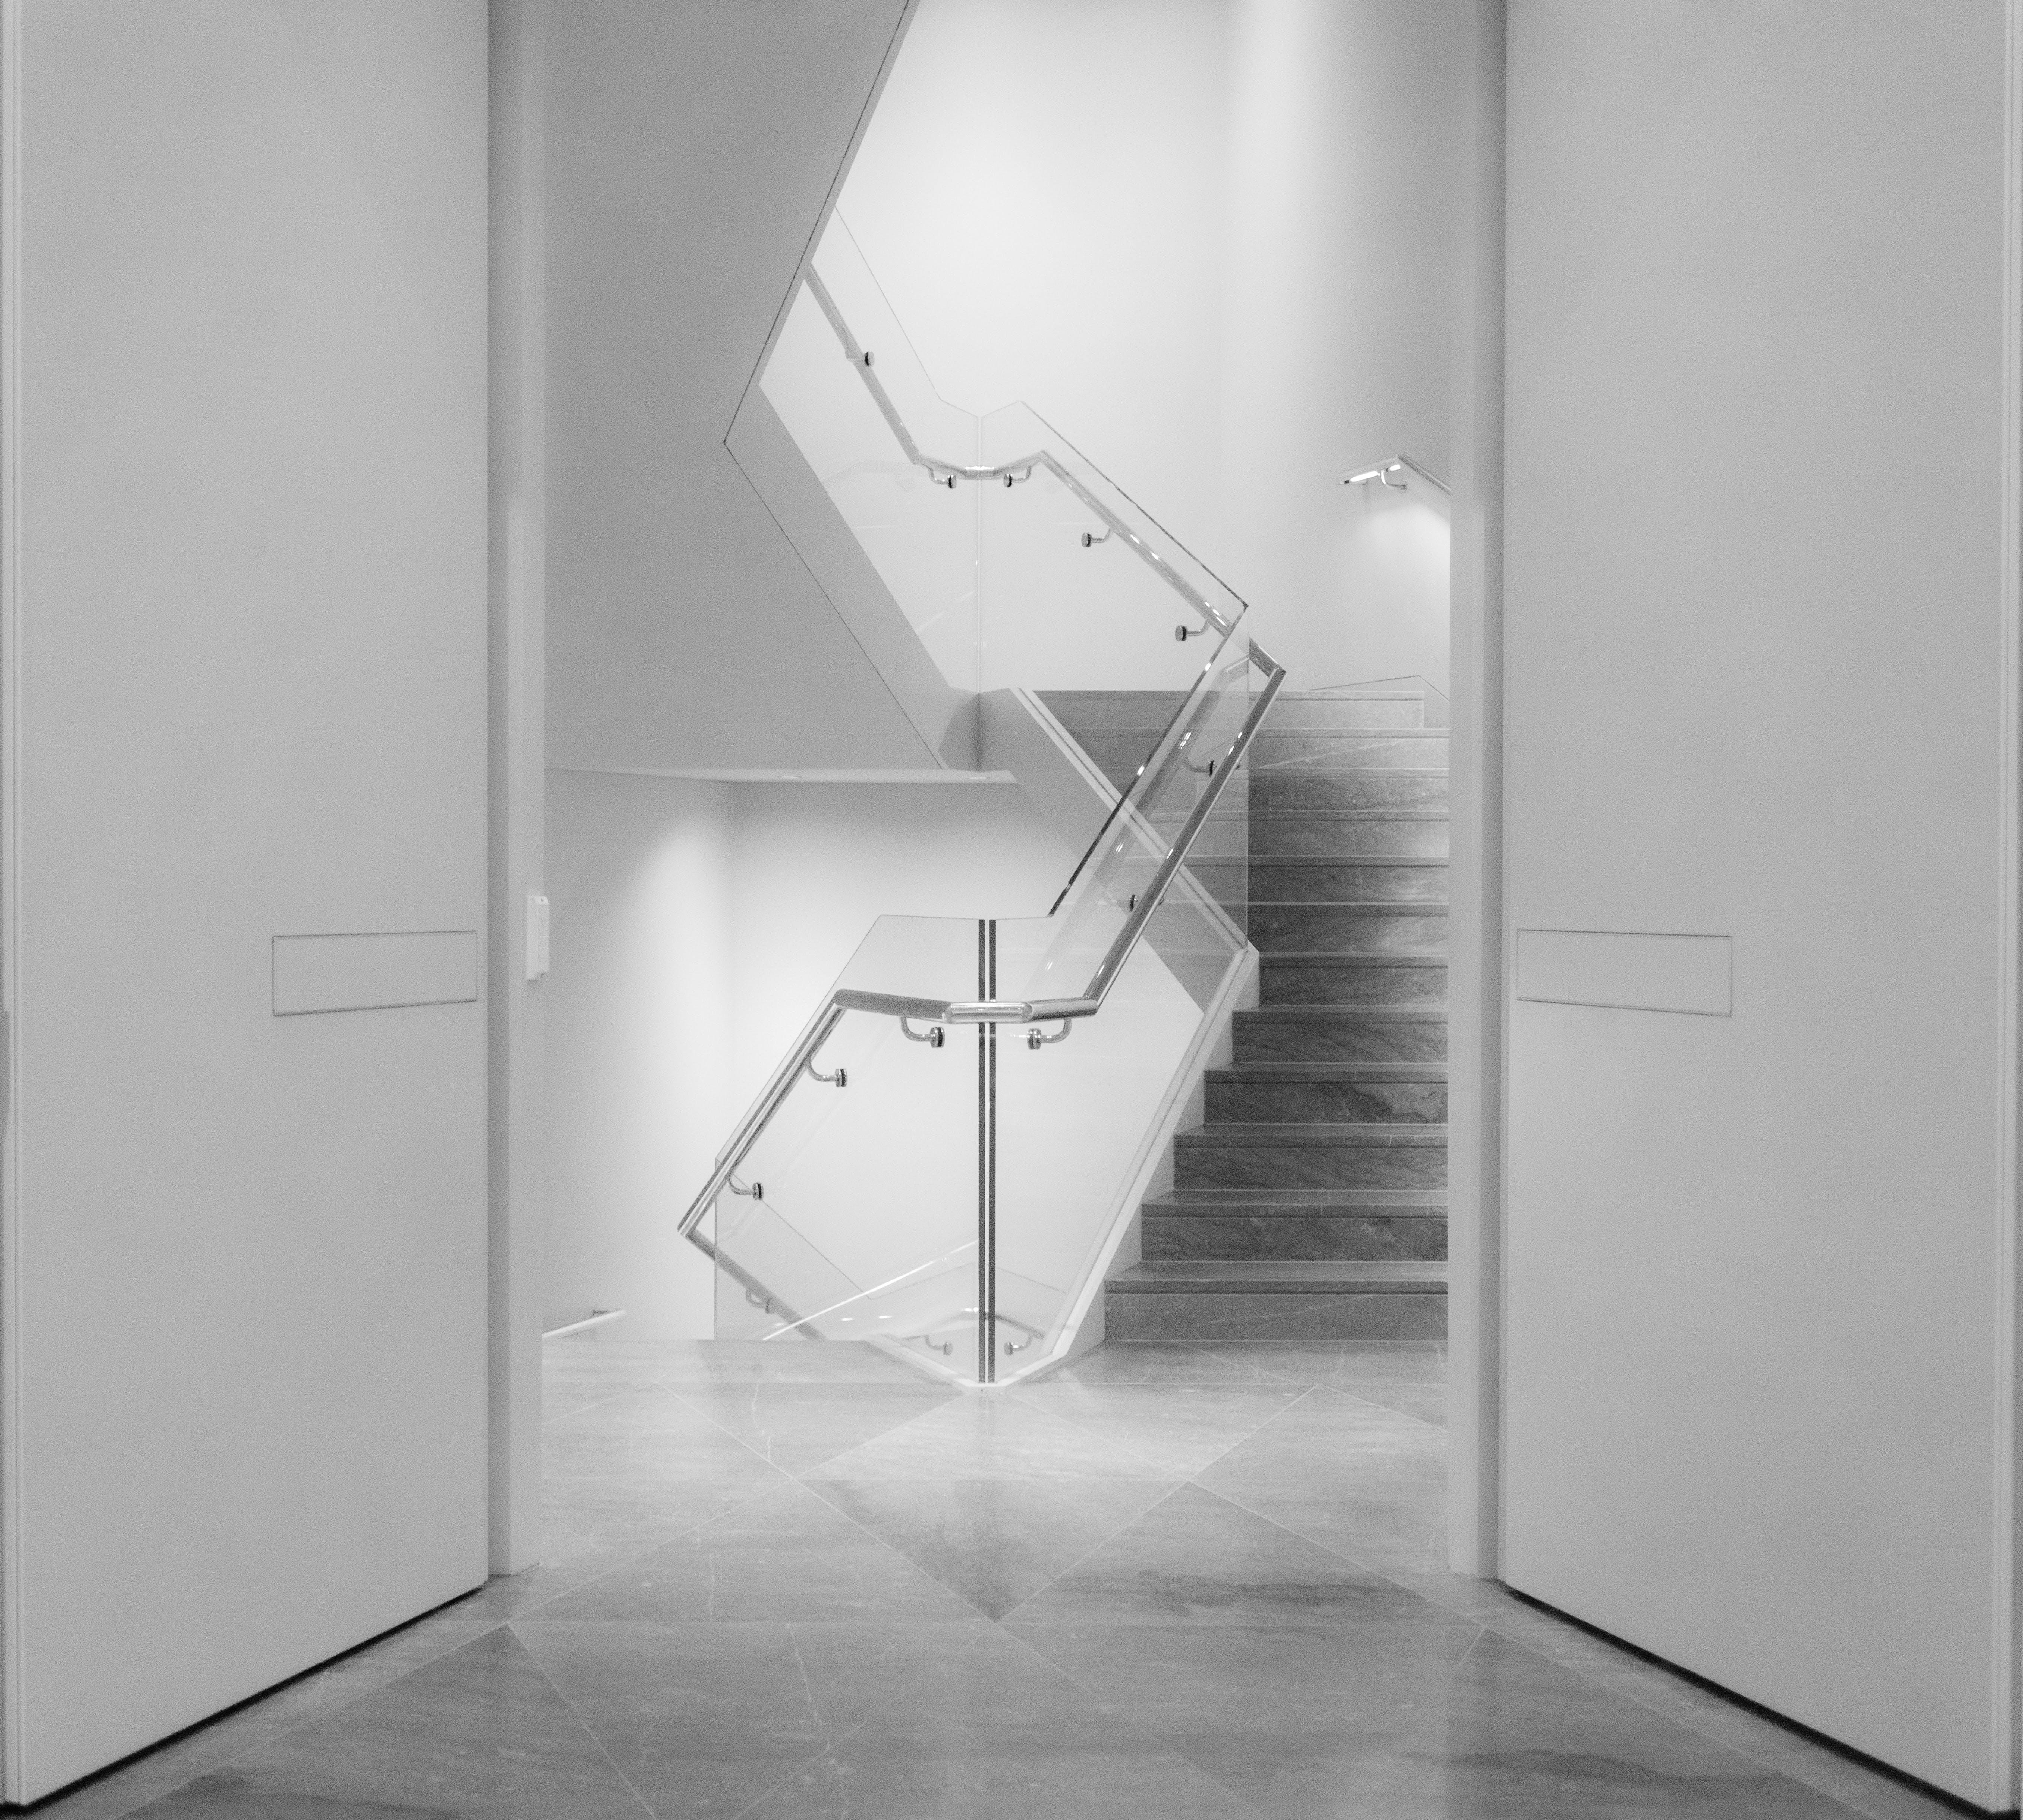 Fotos de stock gratuitas de escalera, escalera de caracol